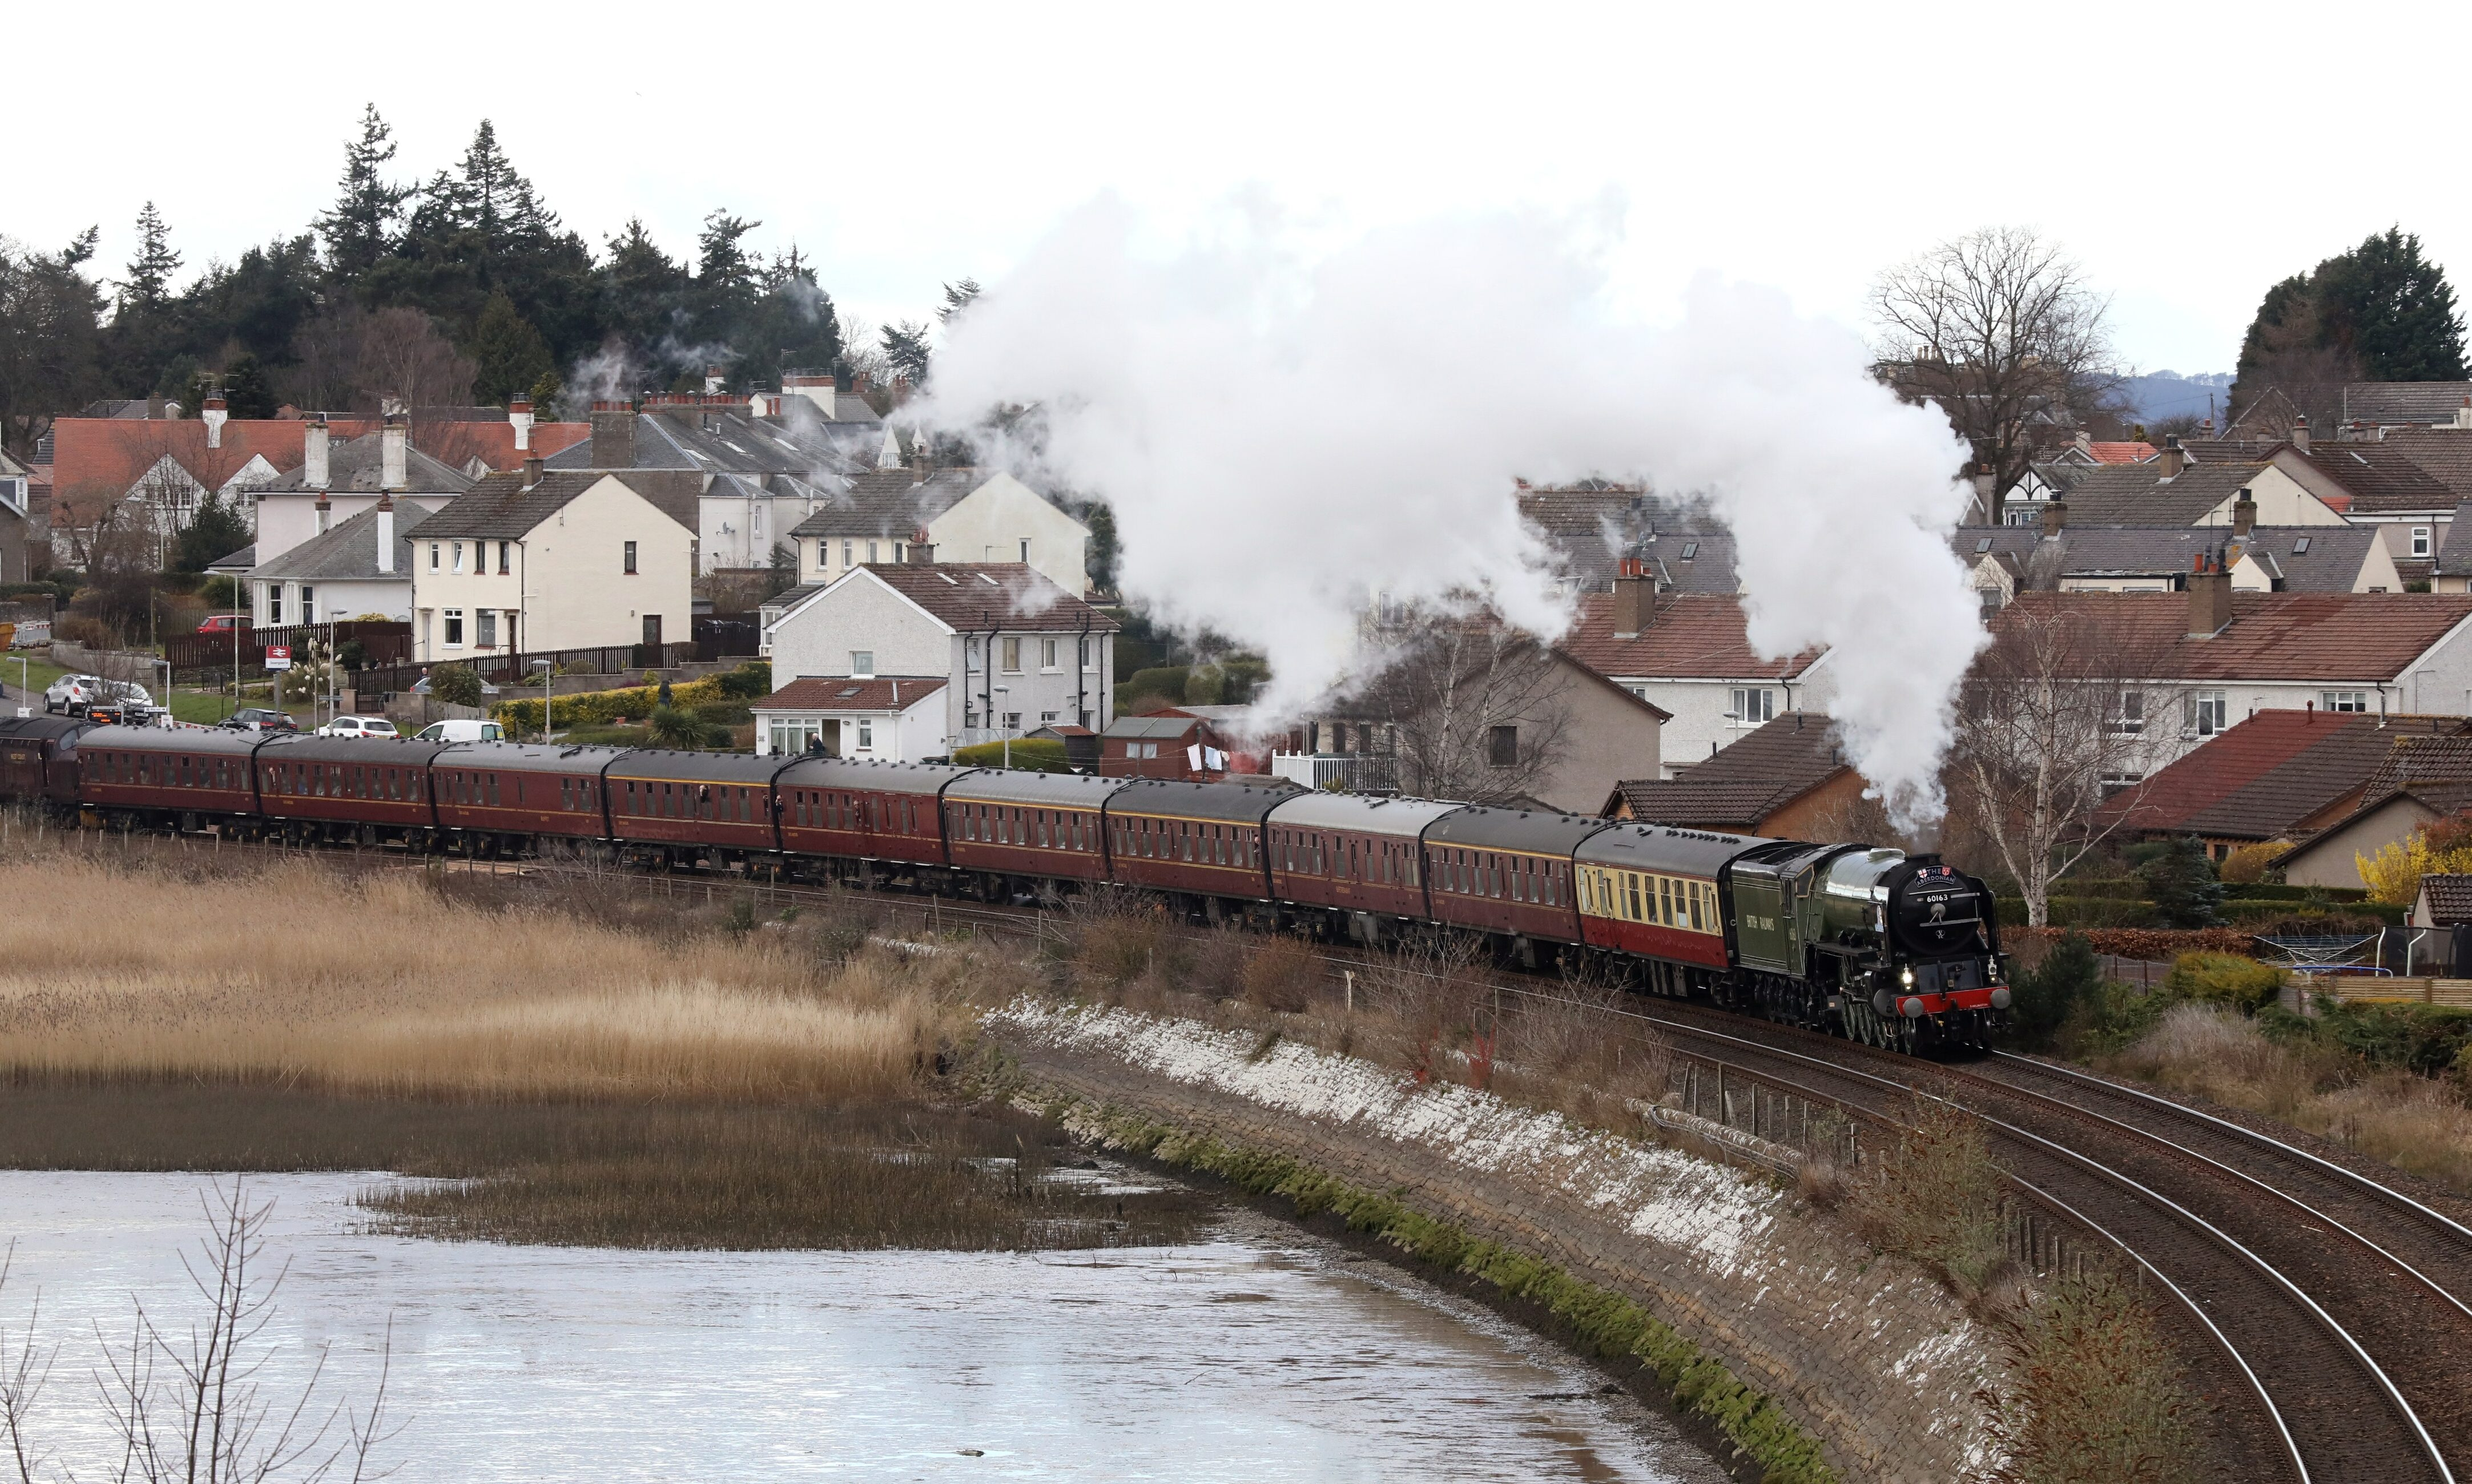 The Tornado steam train passing through Invergowrie Bay.